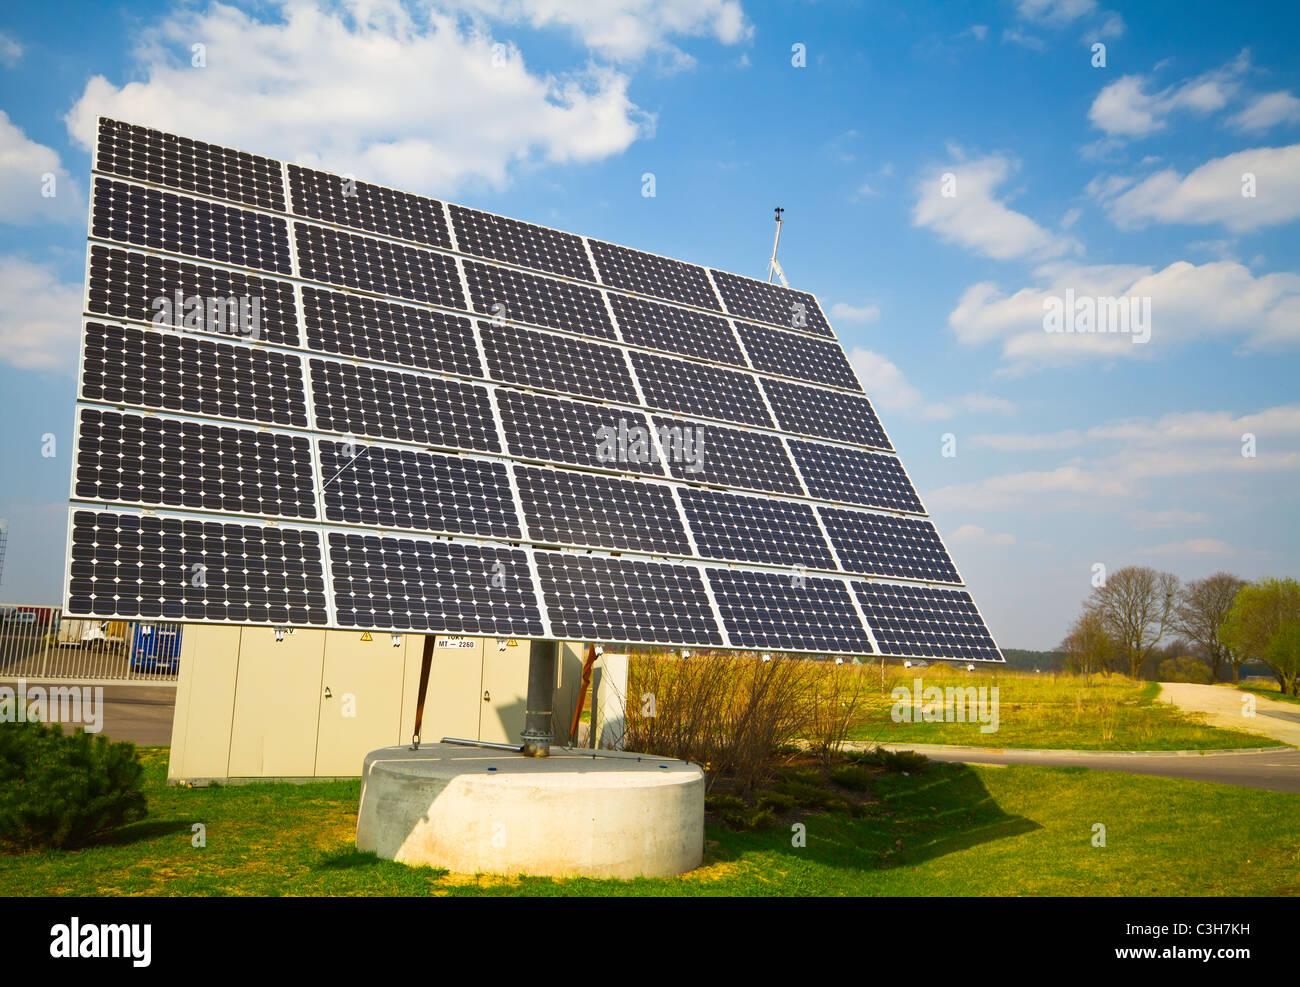 Panel de energía solar Imagen De Stock